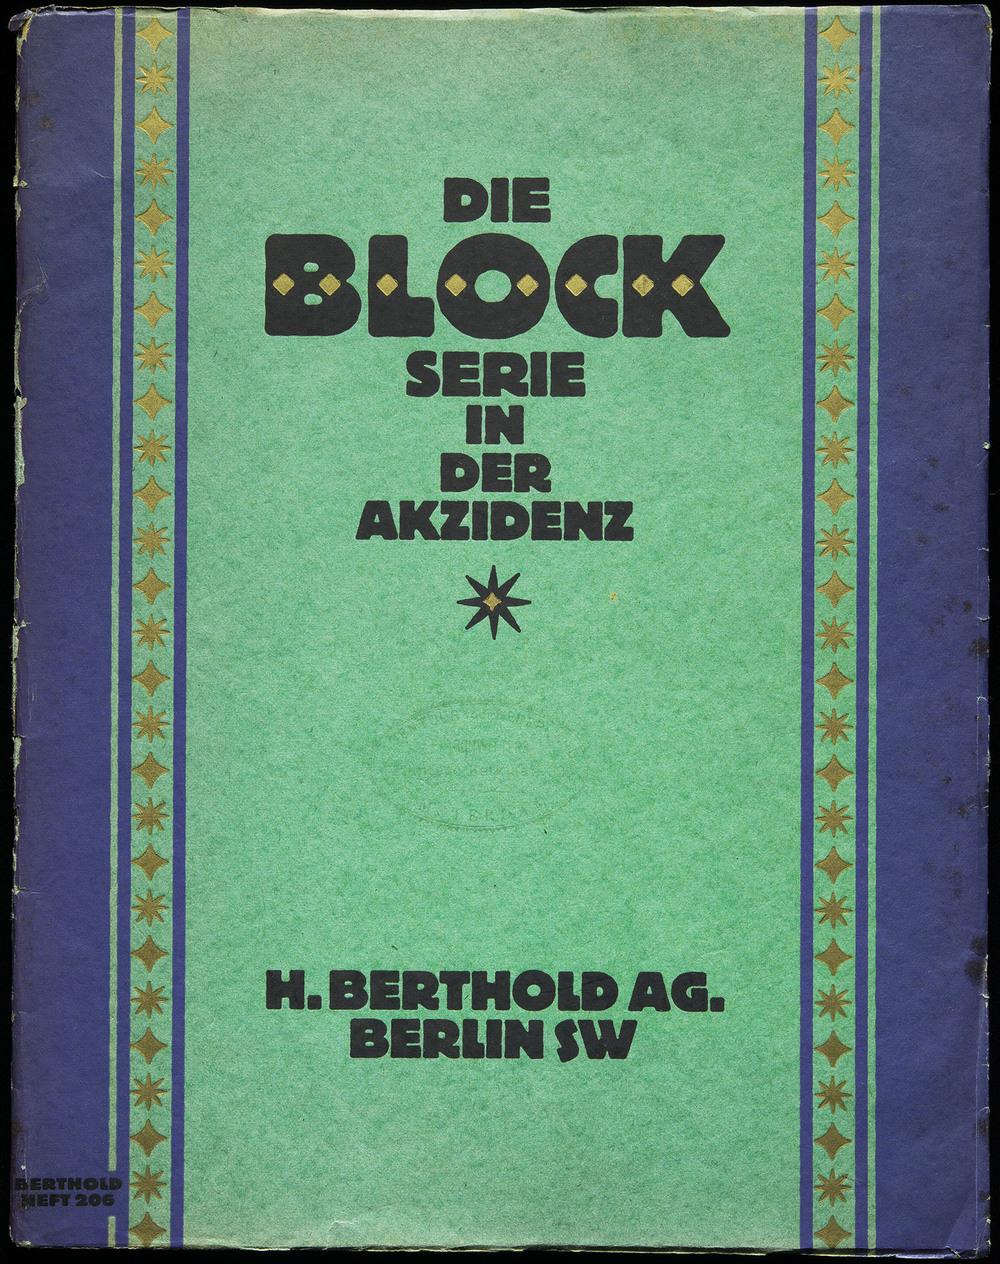 Hermann Hoffmann, specimen of  Block  series, Berthold, Berlin, 1921, 22.8 x 29.2 cm